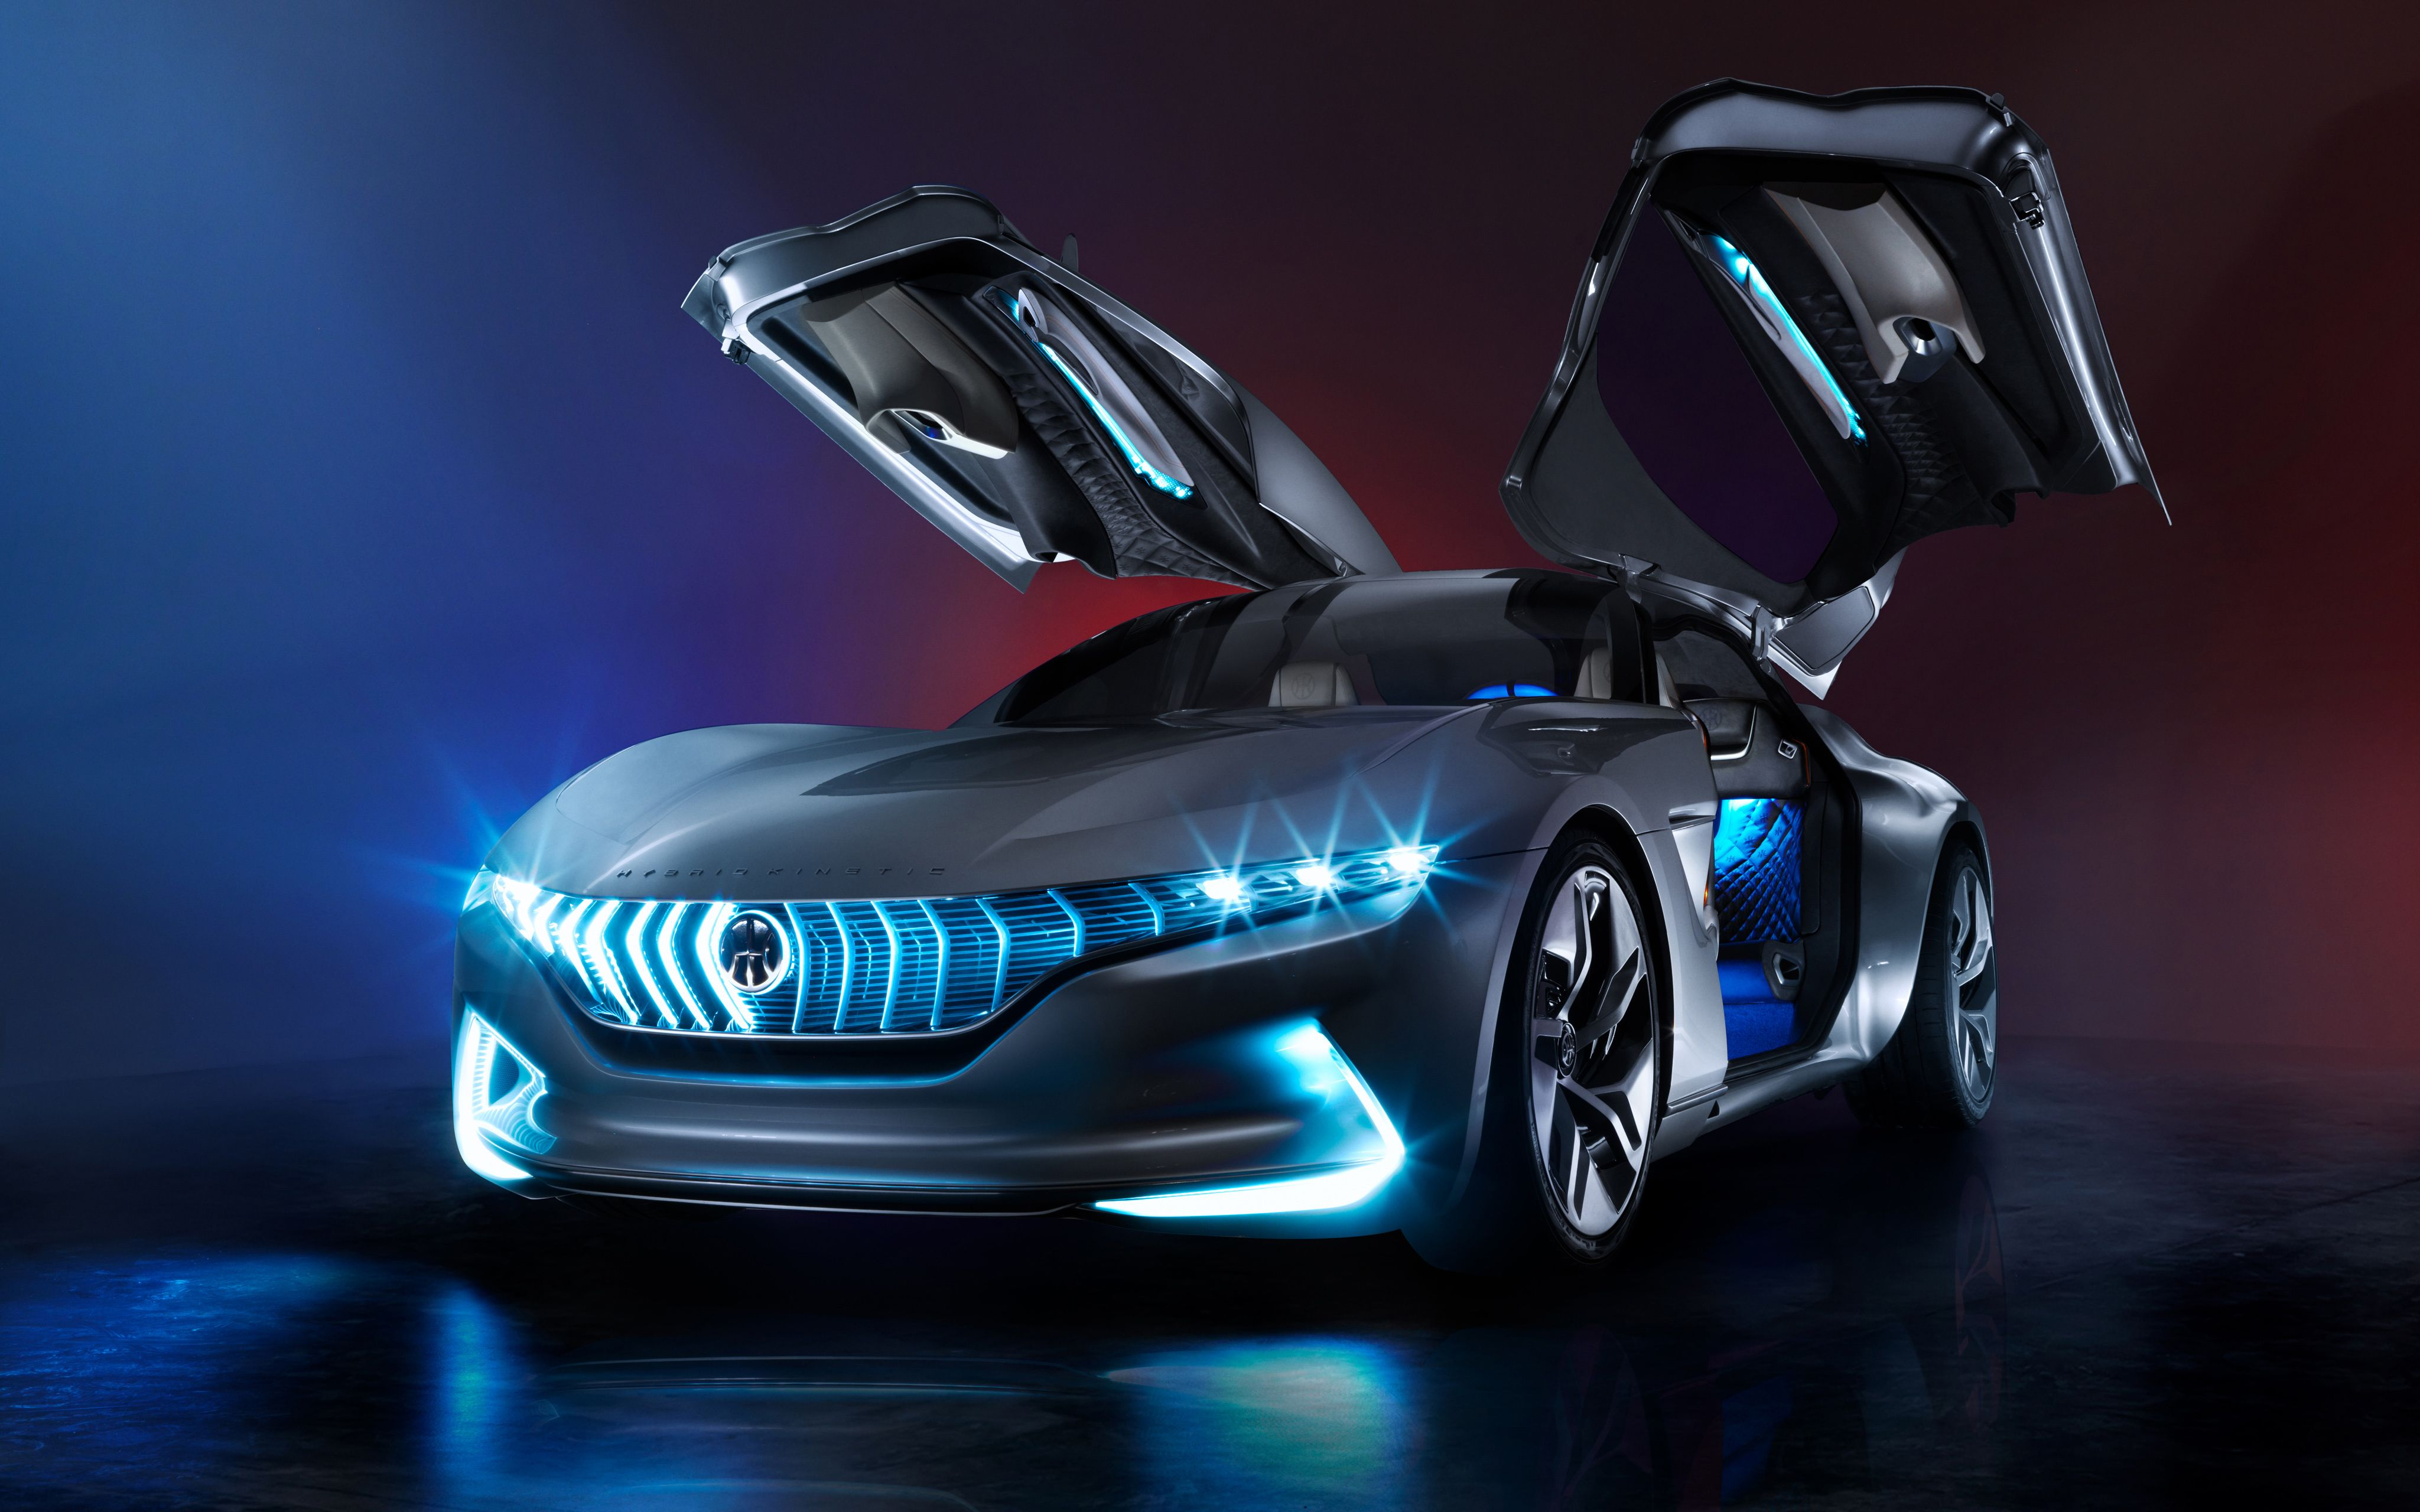 Hybrid Kinetic Gt Geneva Motor Show 2018 4k 4k Hd Wallpapers